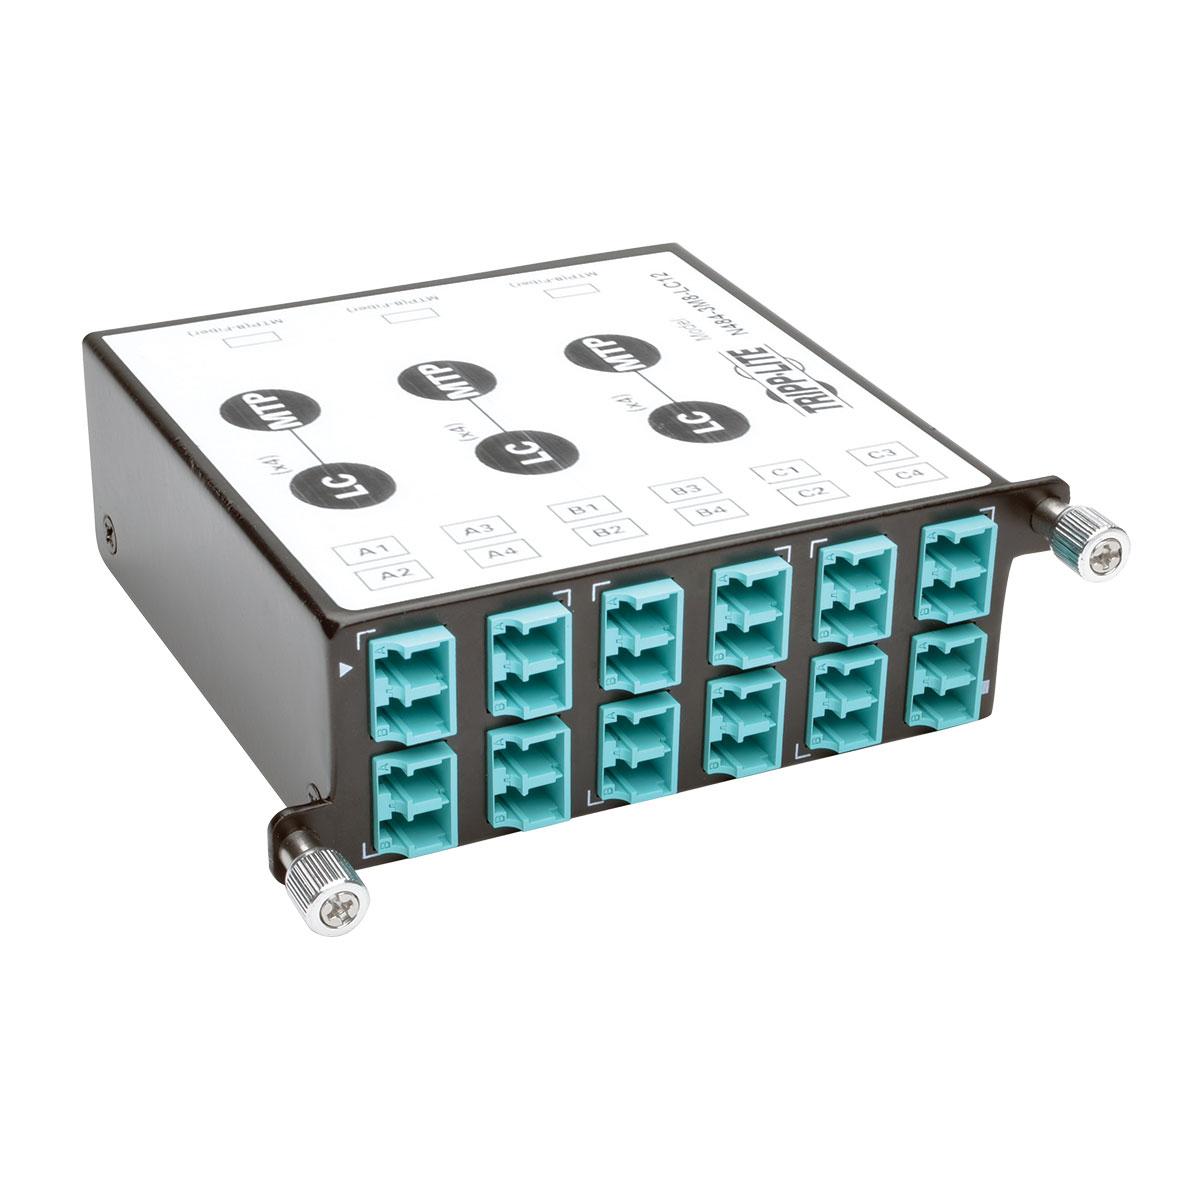 Tripp Lite N484-3M8-LC12 patch panel